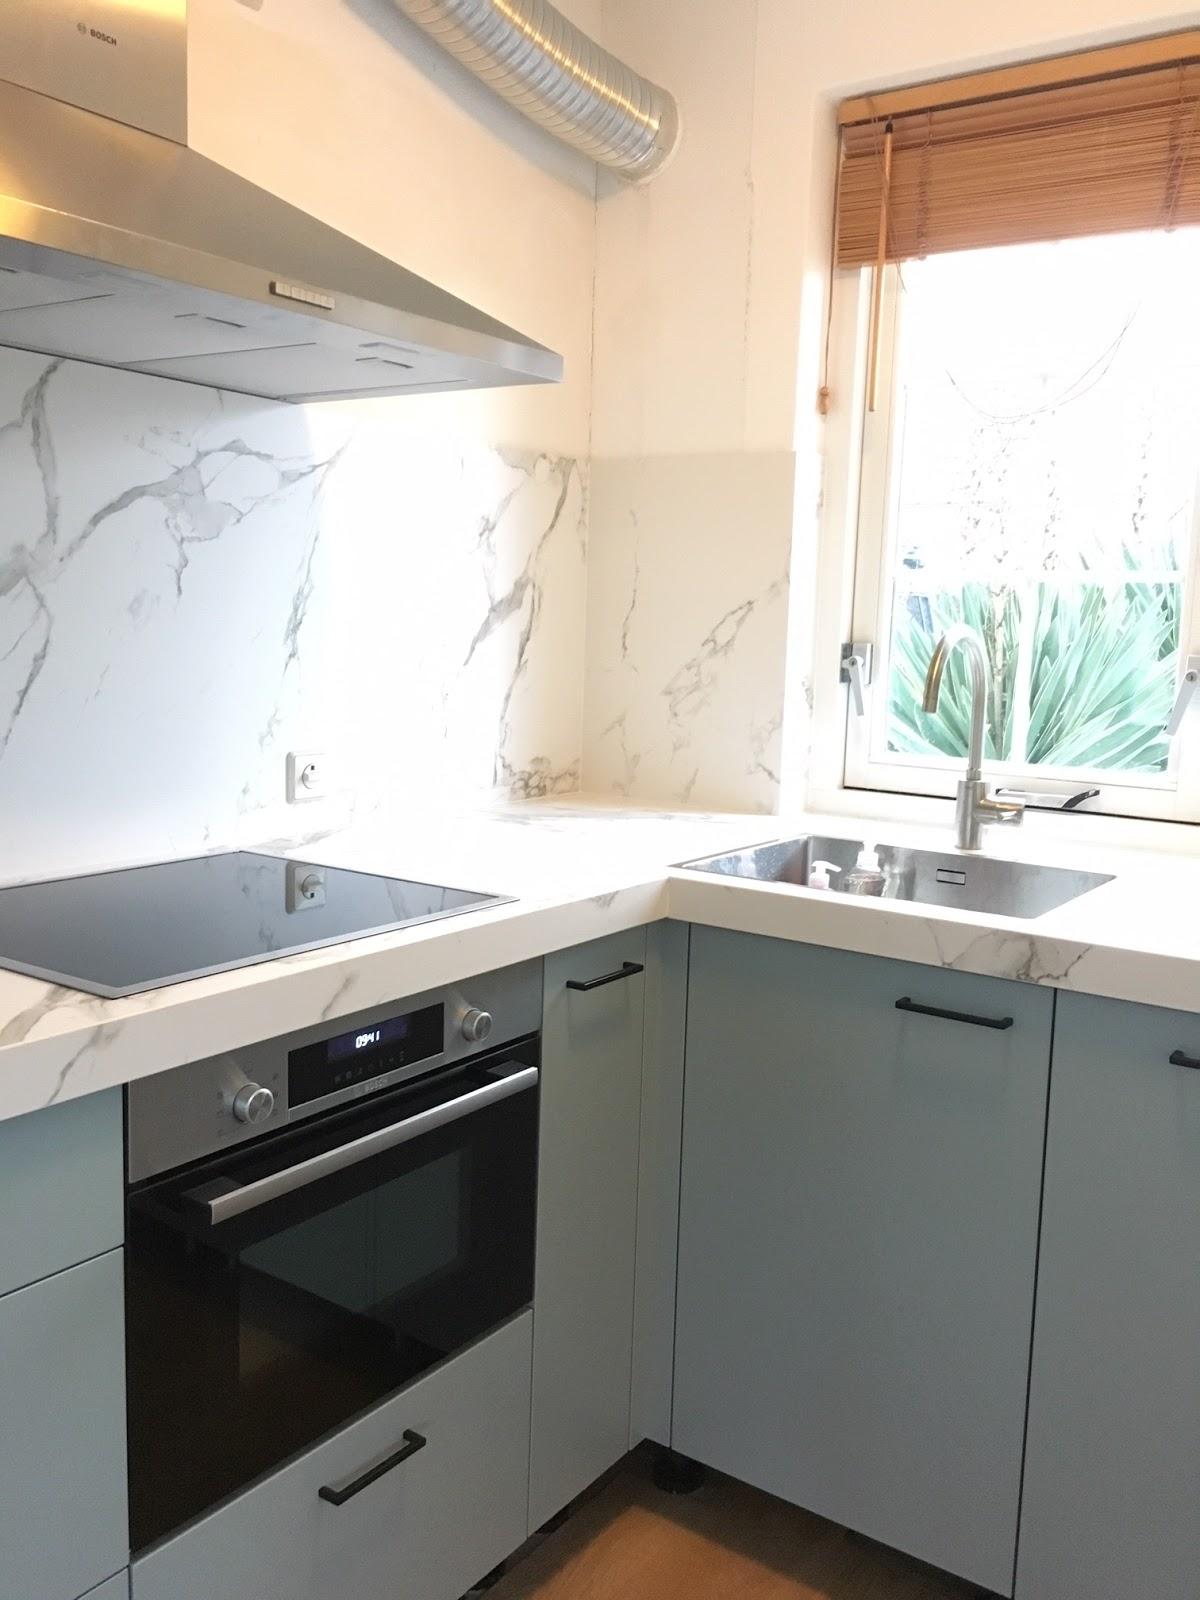 Dekton countertop, resistant worktops, Quartz, recycled glass, Ikea counterops difference. Best countertops